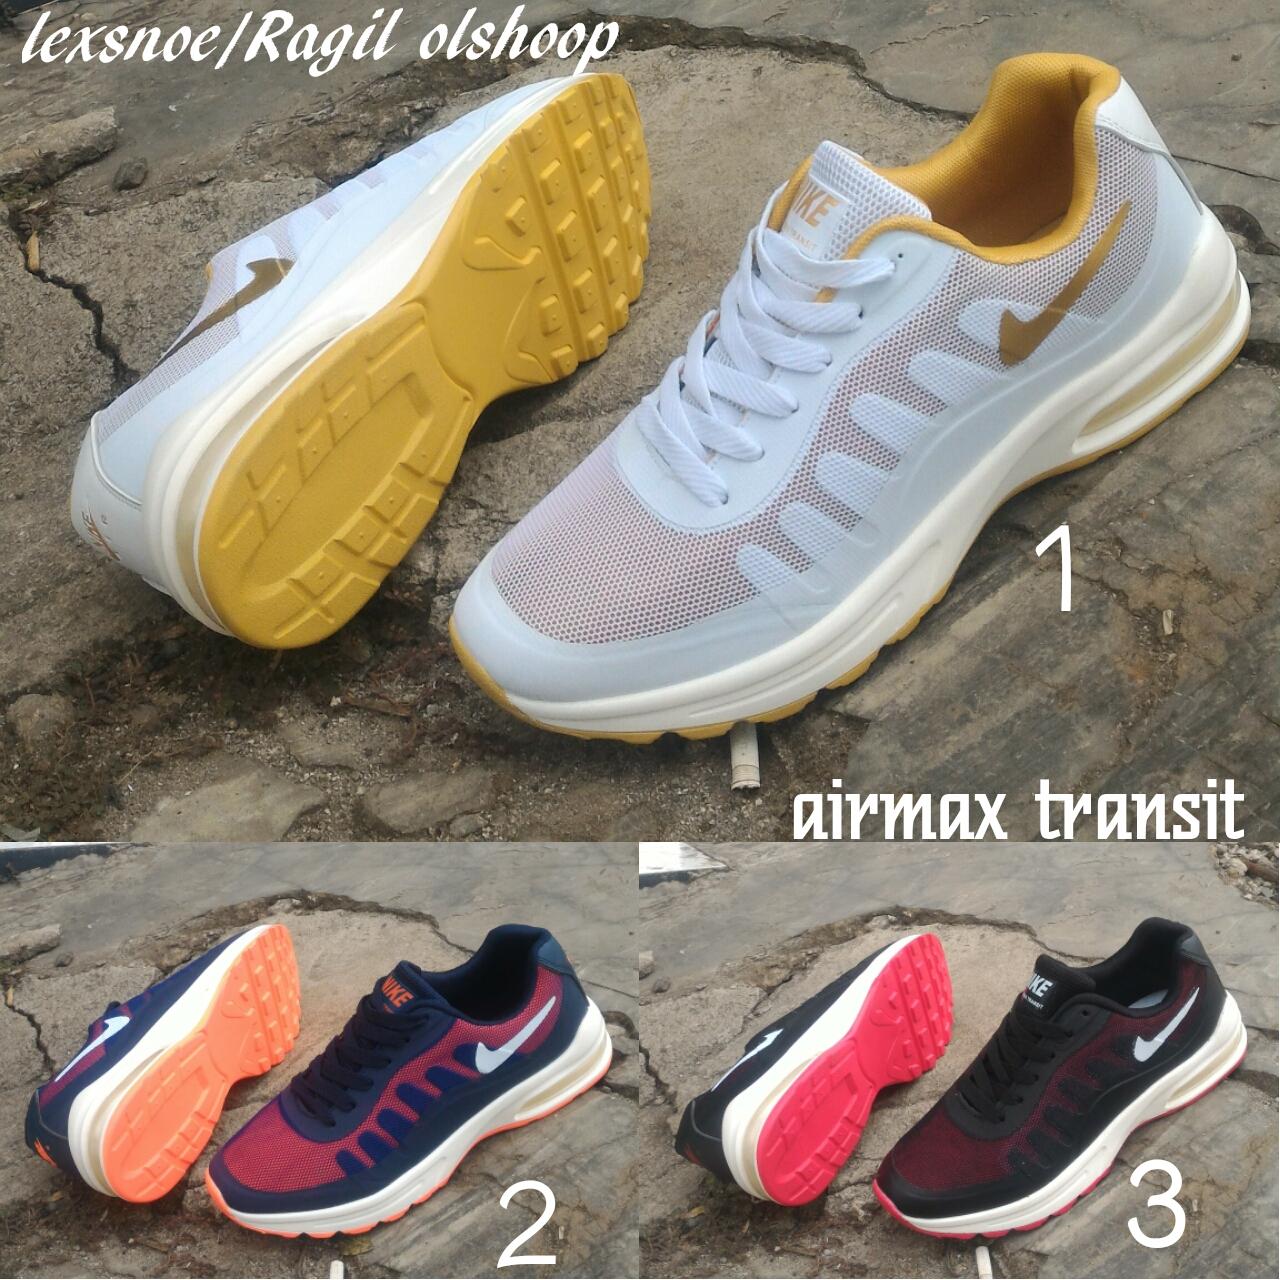 new rillis sepatu nike airmax transit sepatu running dan gaul